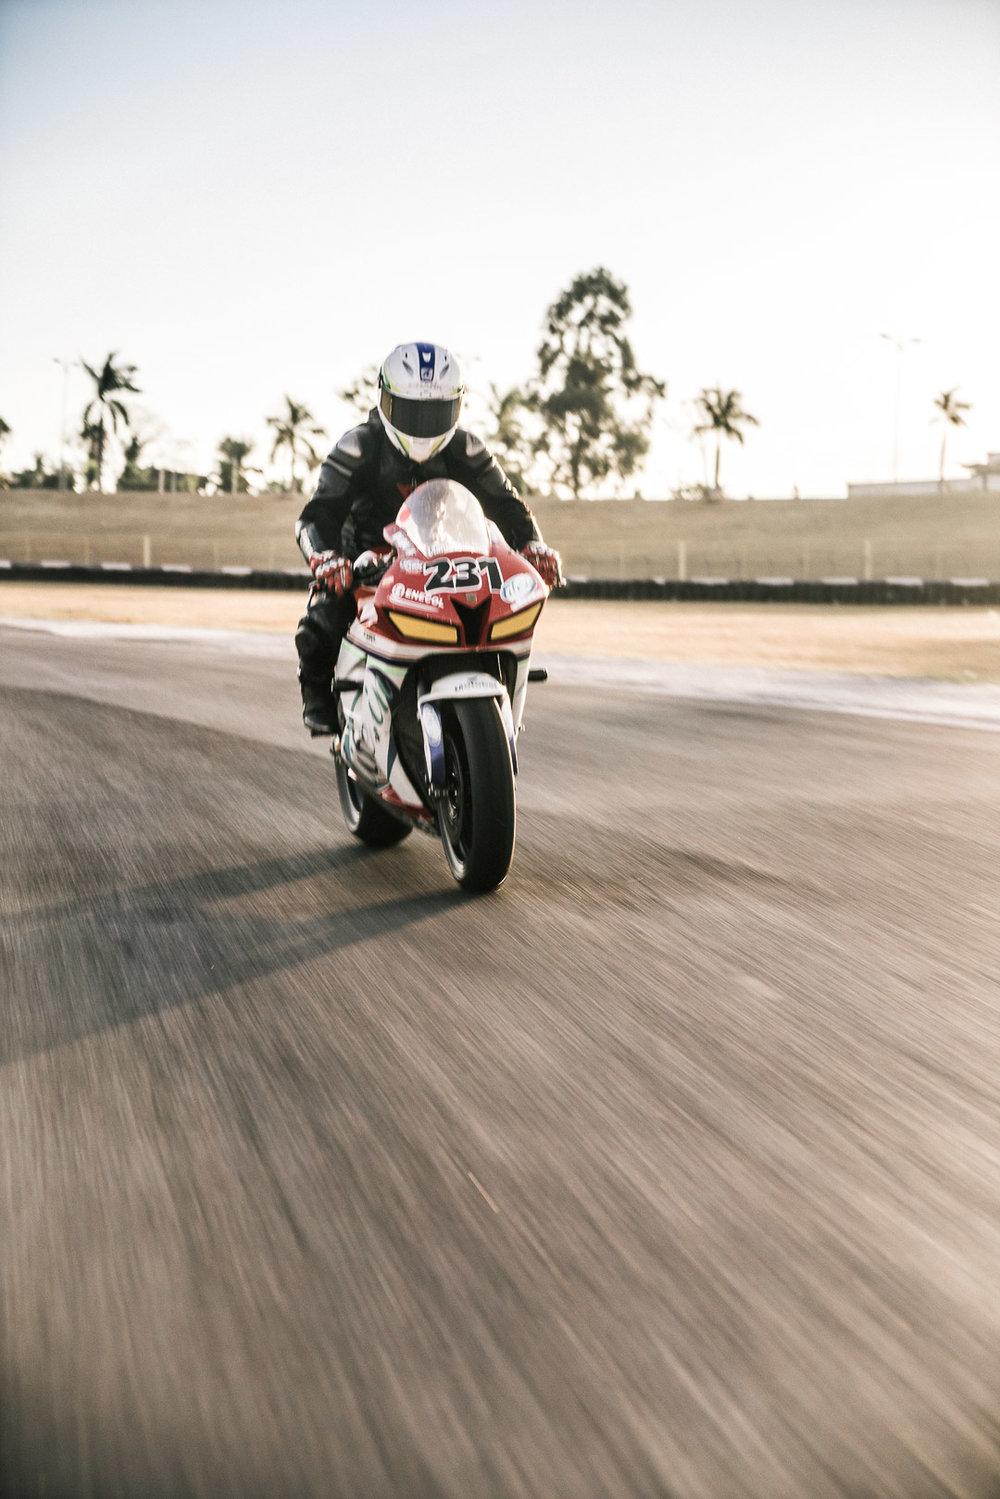 Ensaio moto Velocidade Autódromo Goiania